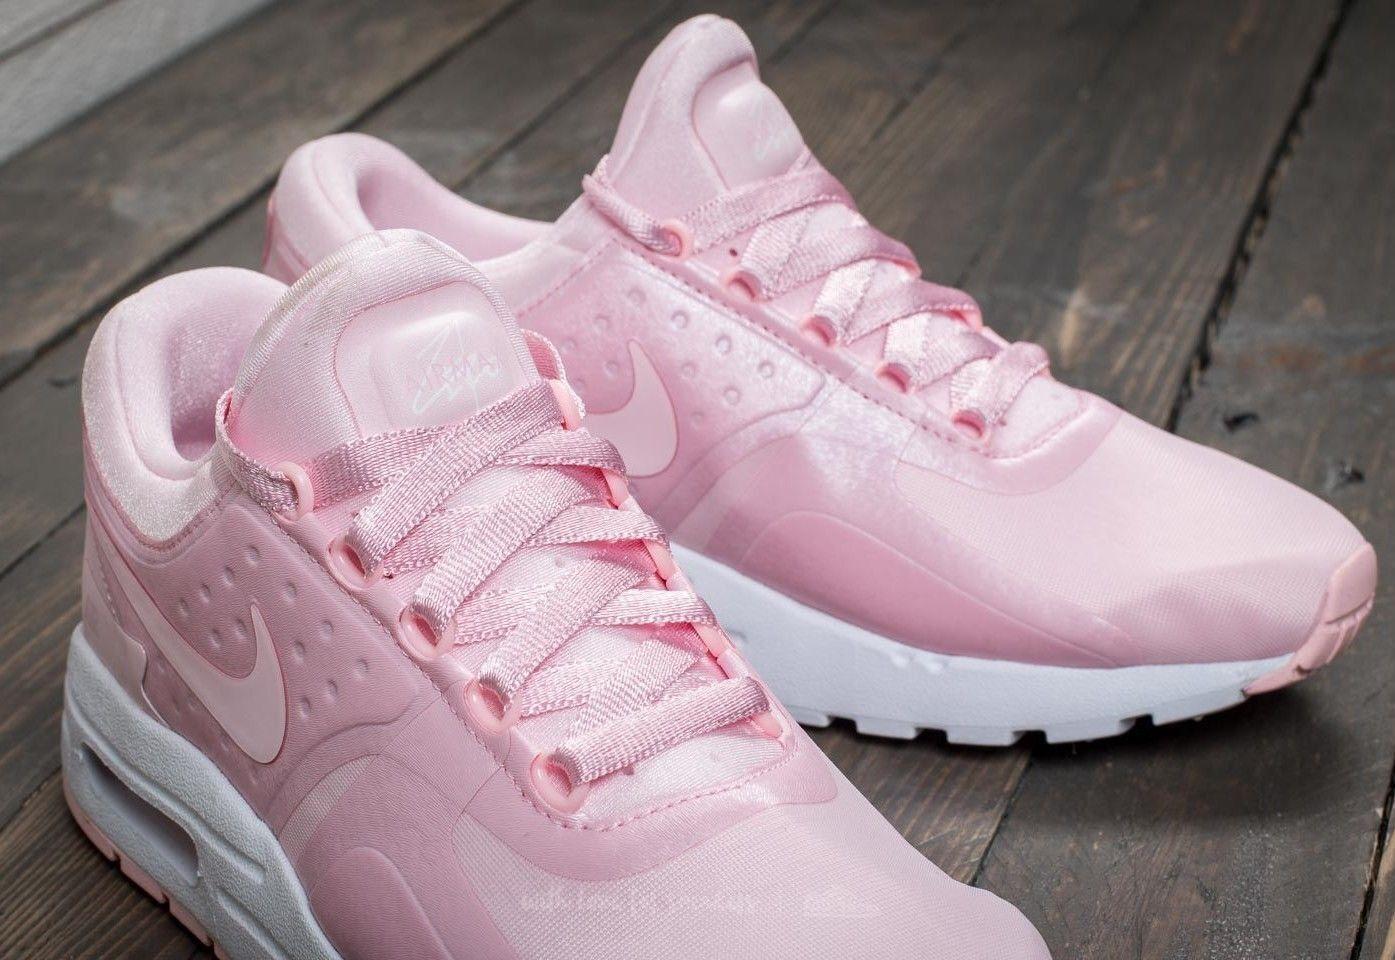 BNIB Pink New Damens Nike Air Max Zero SE Pink BNIB Grün Igloo Größe 4 5 6 uk 27f20e